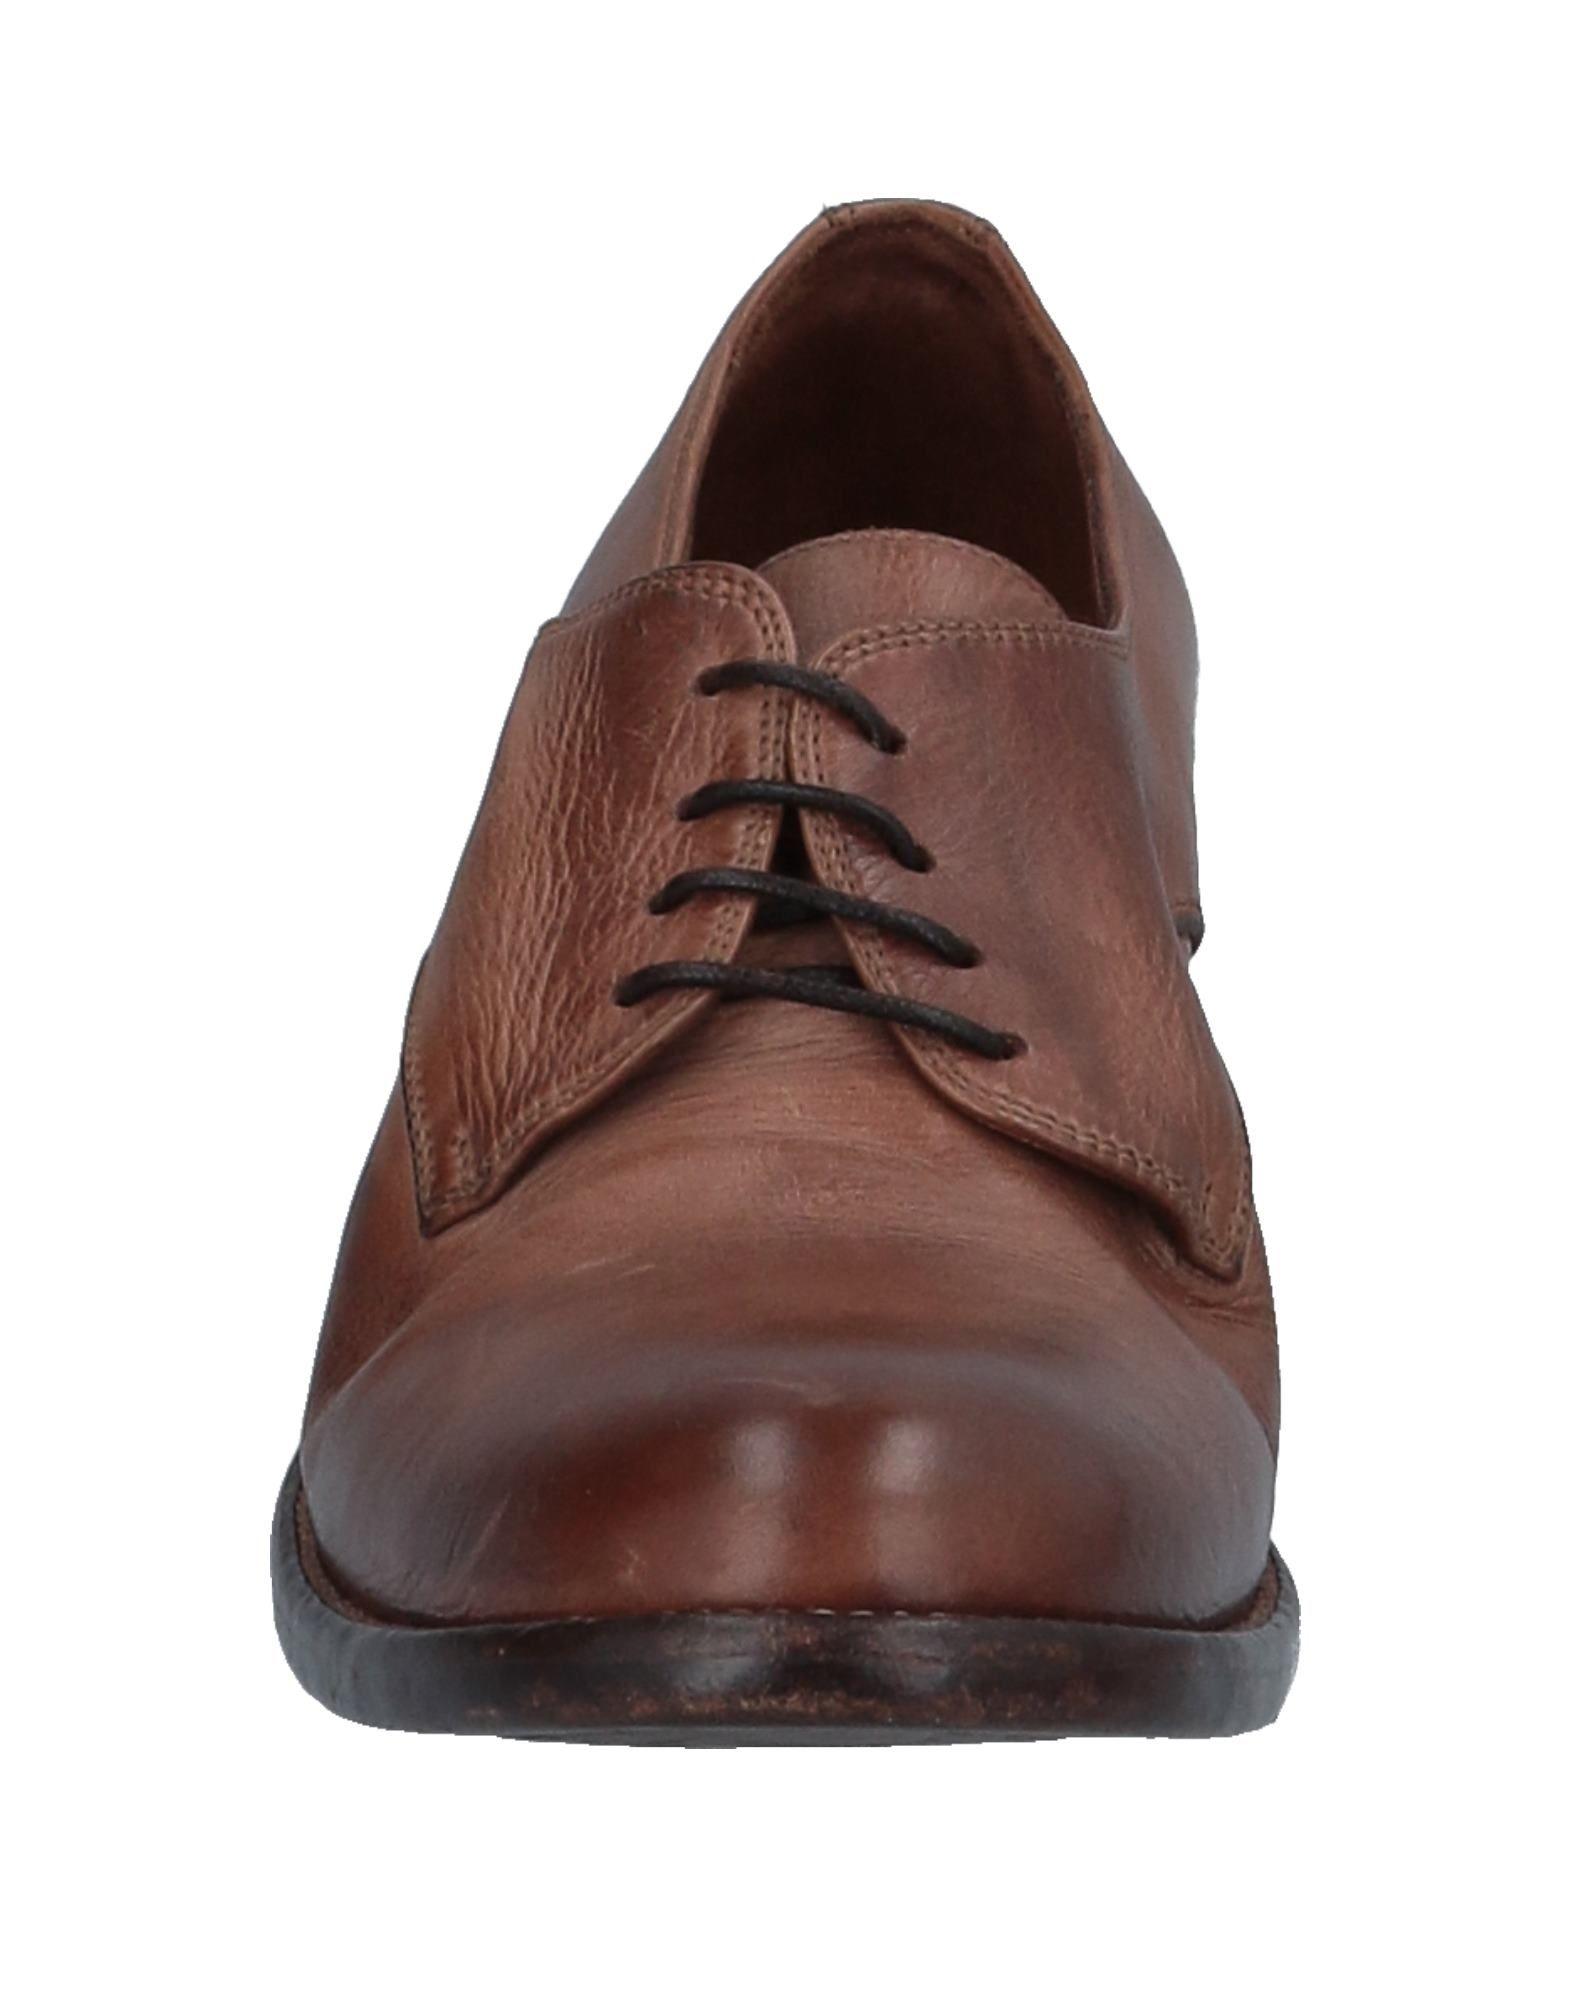 Rabatt  Schuhe Sartore Schnürschuhe Damen  Rabatt 11543281KL 2be0f7